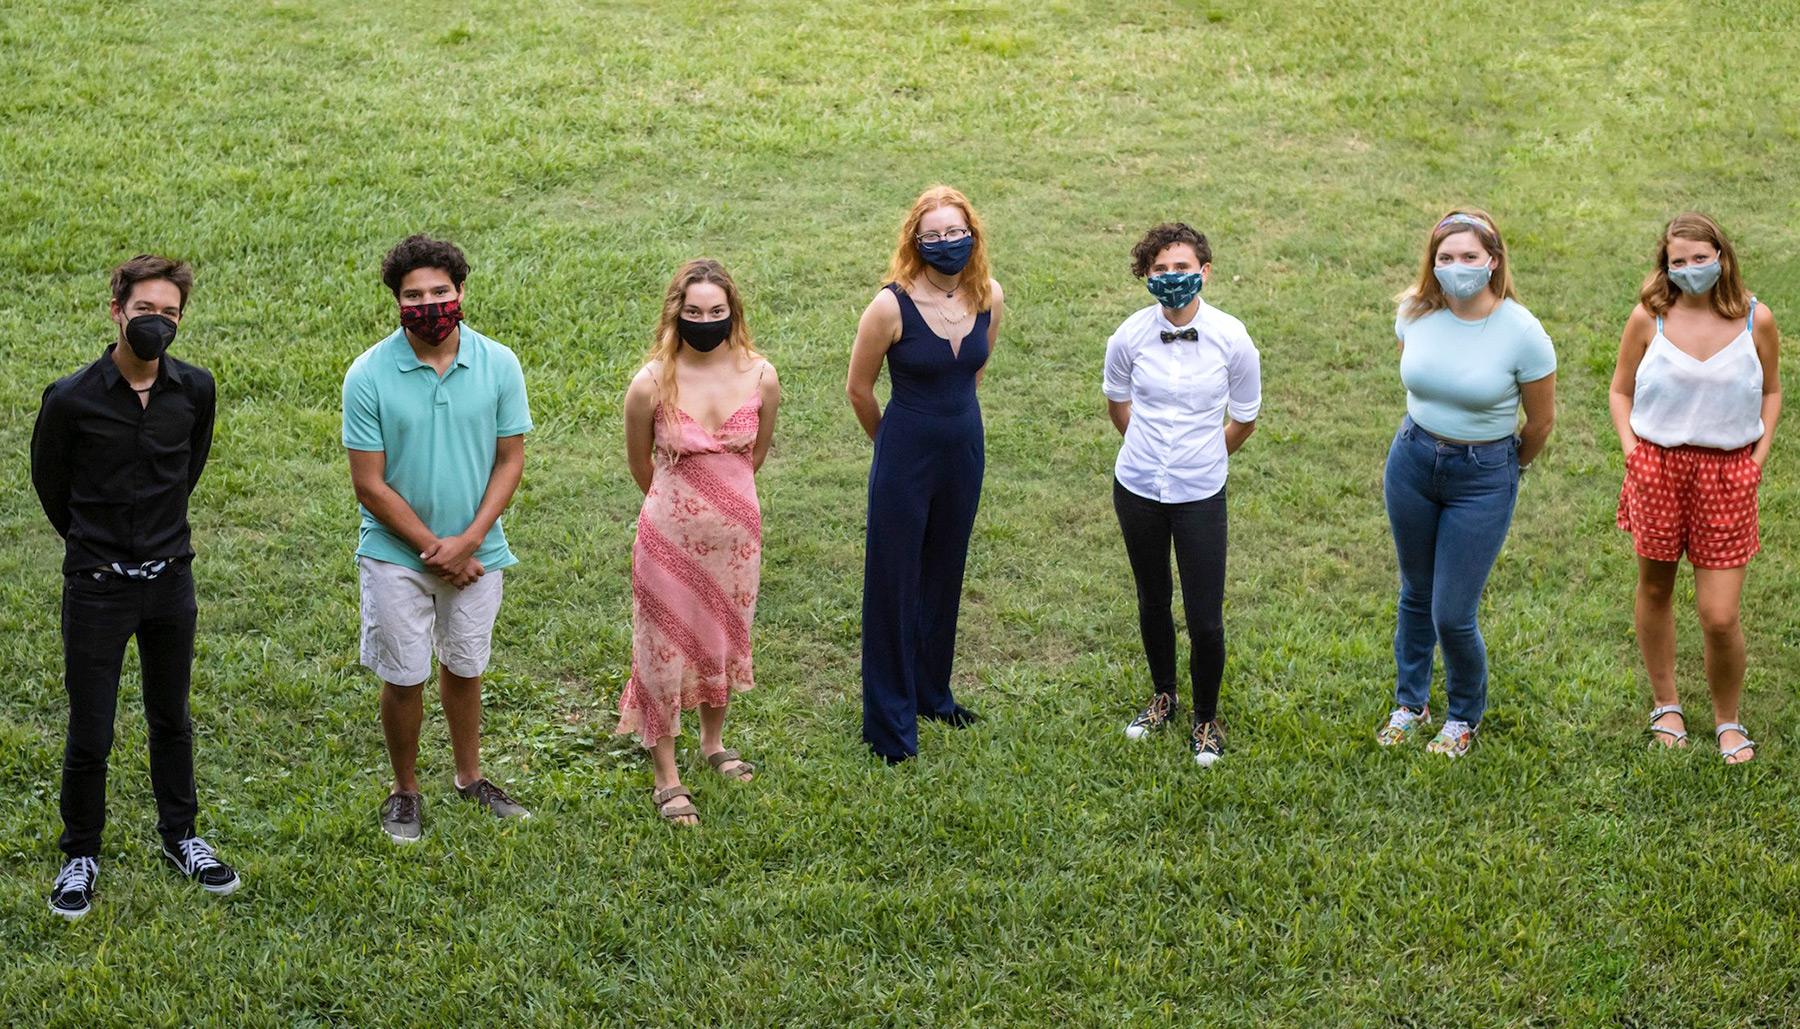 Seven Hollings Scholars from Eckerd College standing in grass